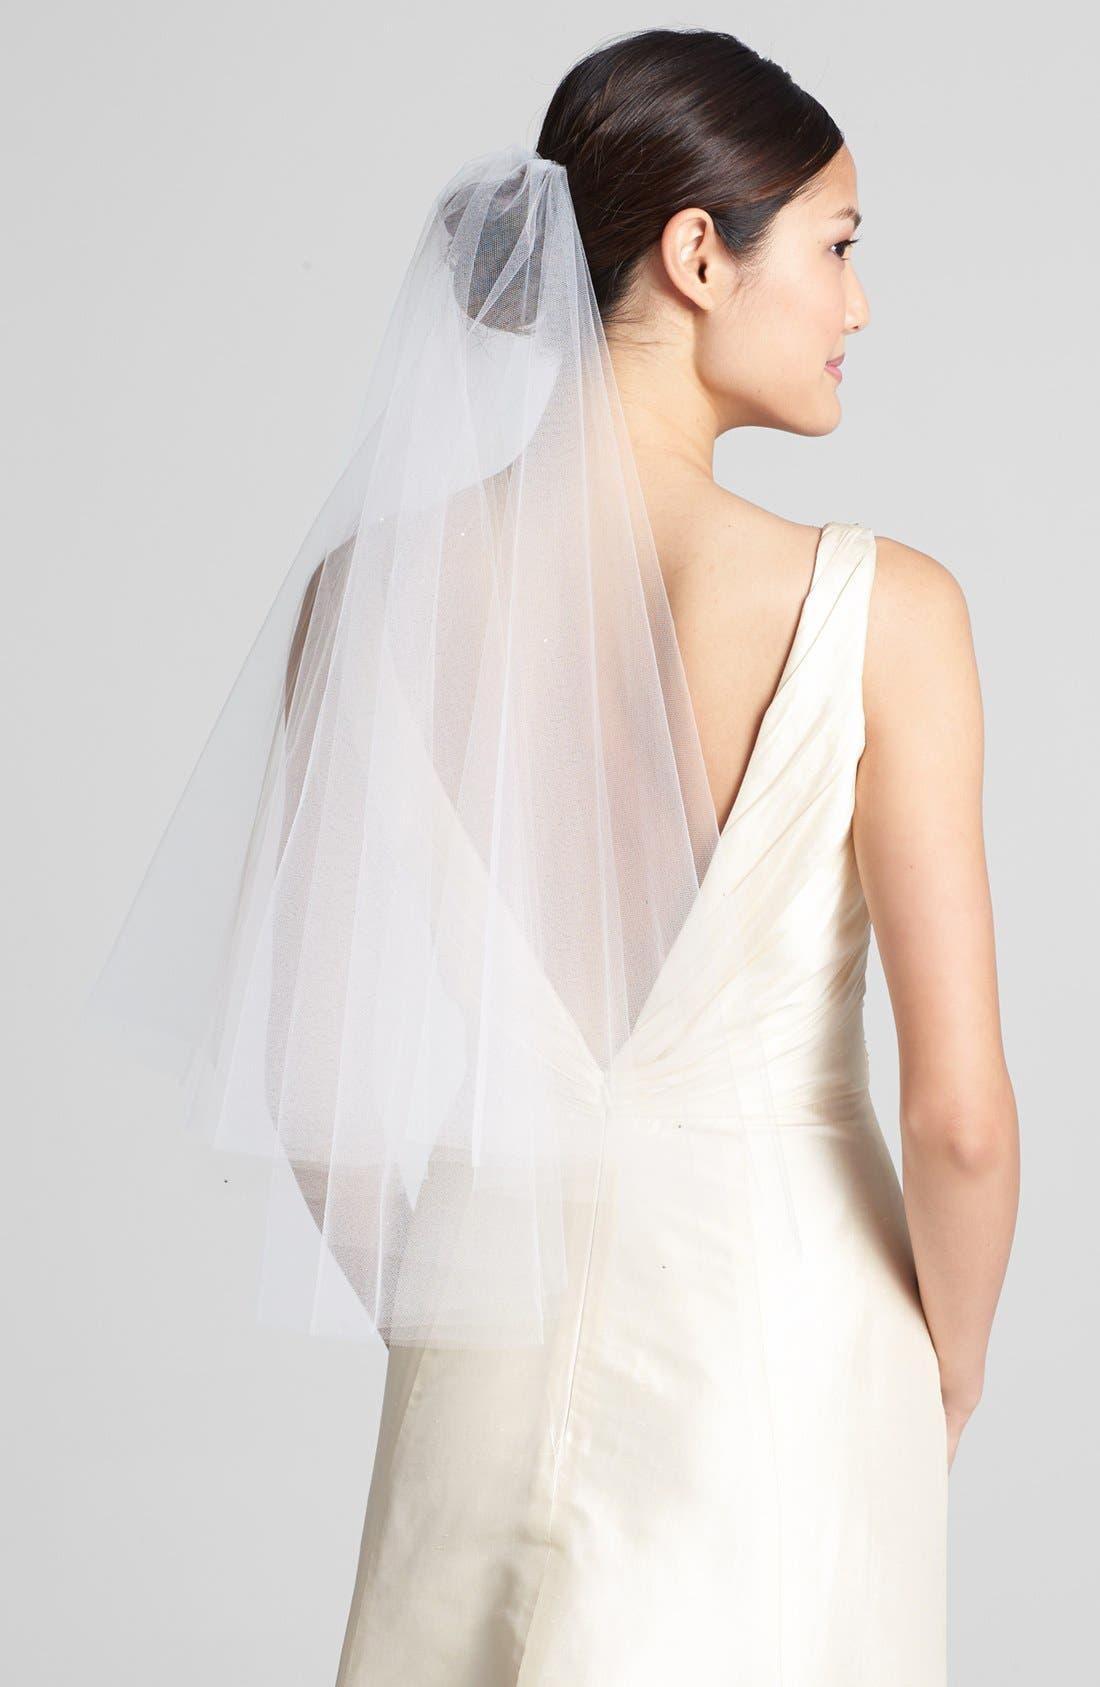 Wedding Belles New York 'Madeline - Crystal' Two Tier Veil (Nordstrom Exclusive)